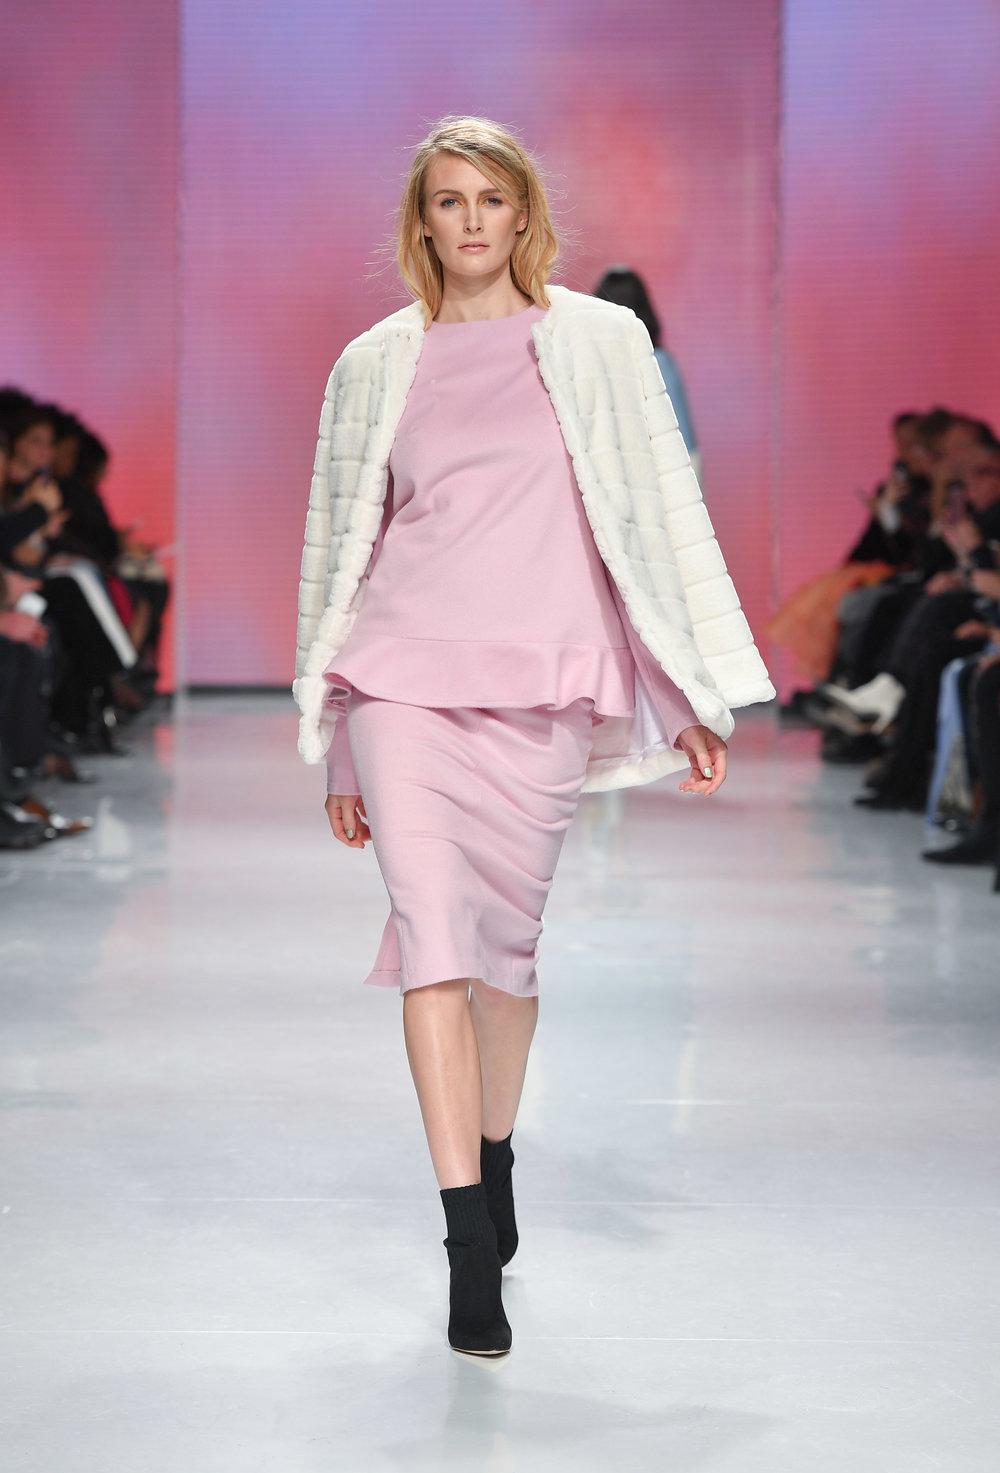 66388-hilary-macmillan-toronto-fashion-week-february-2018-yorkville-village-2.jpg